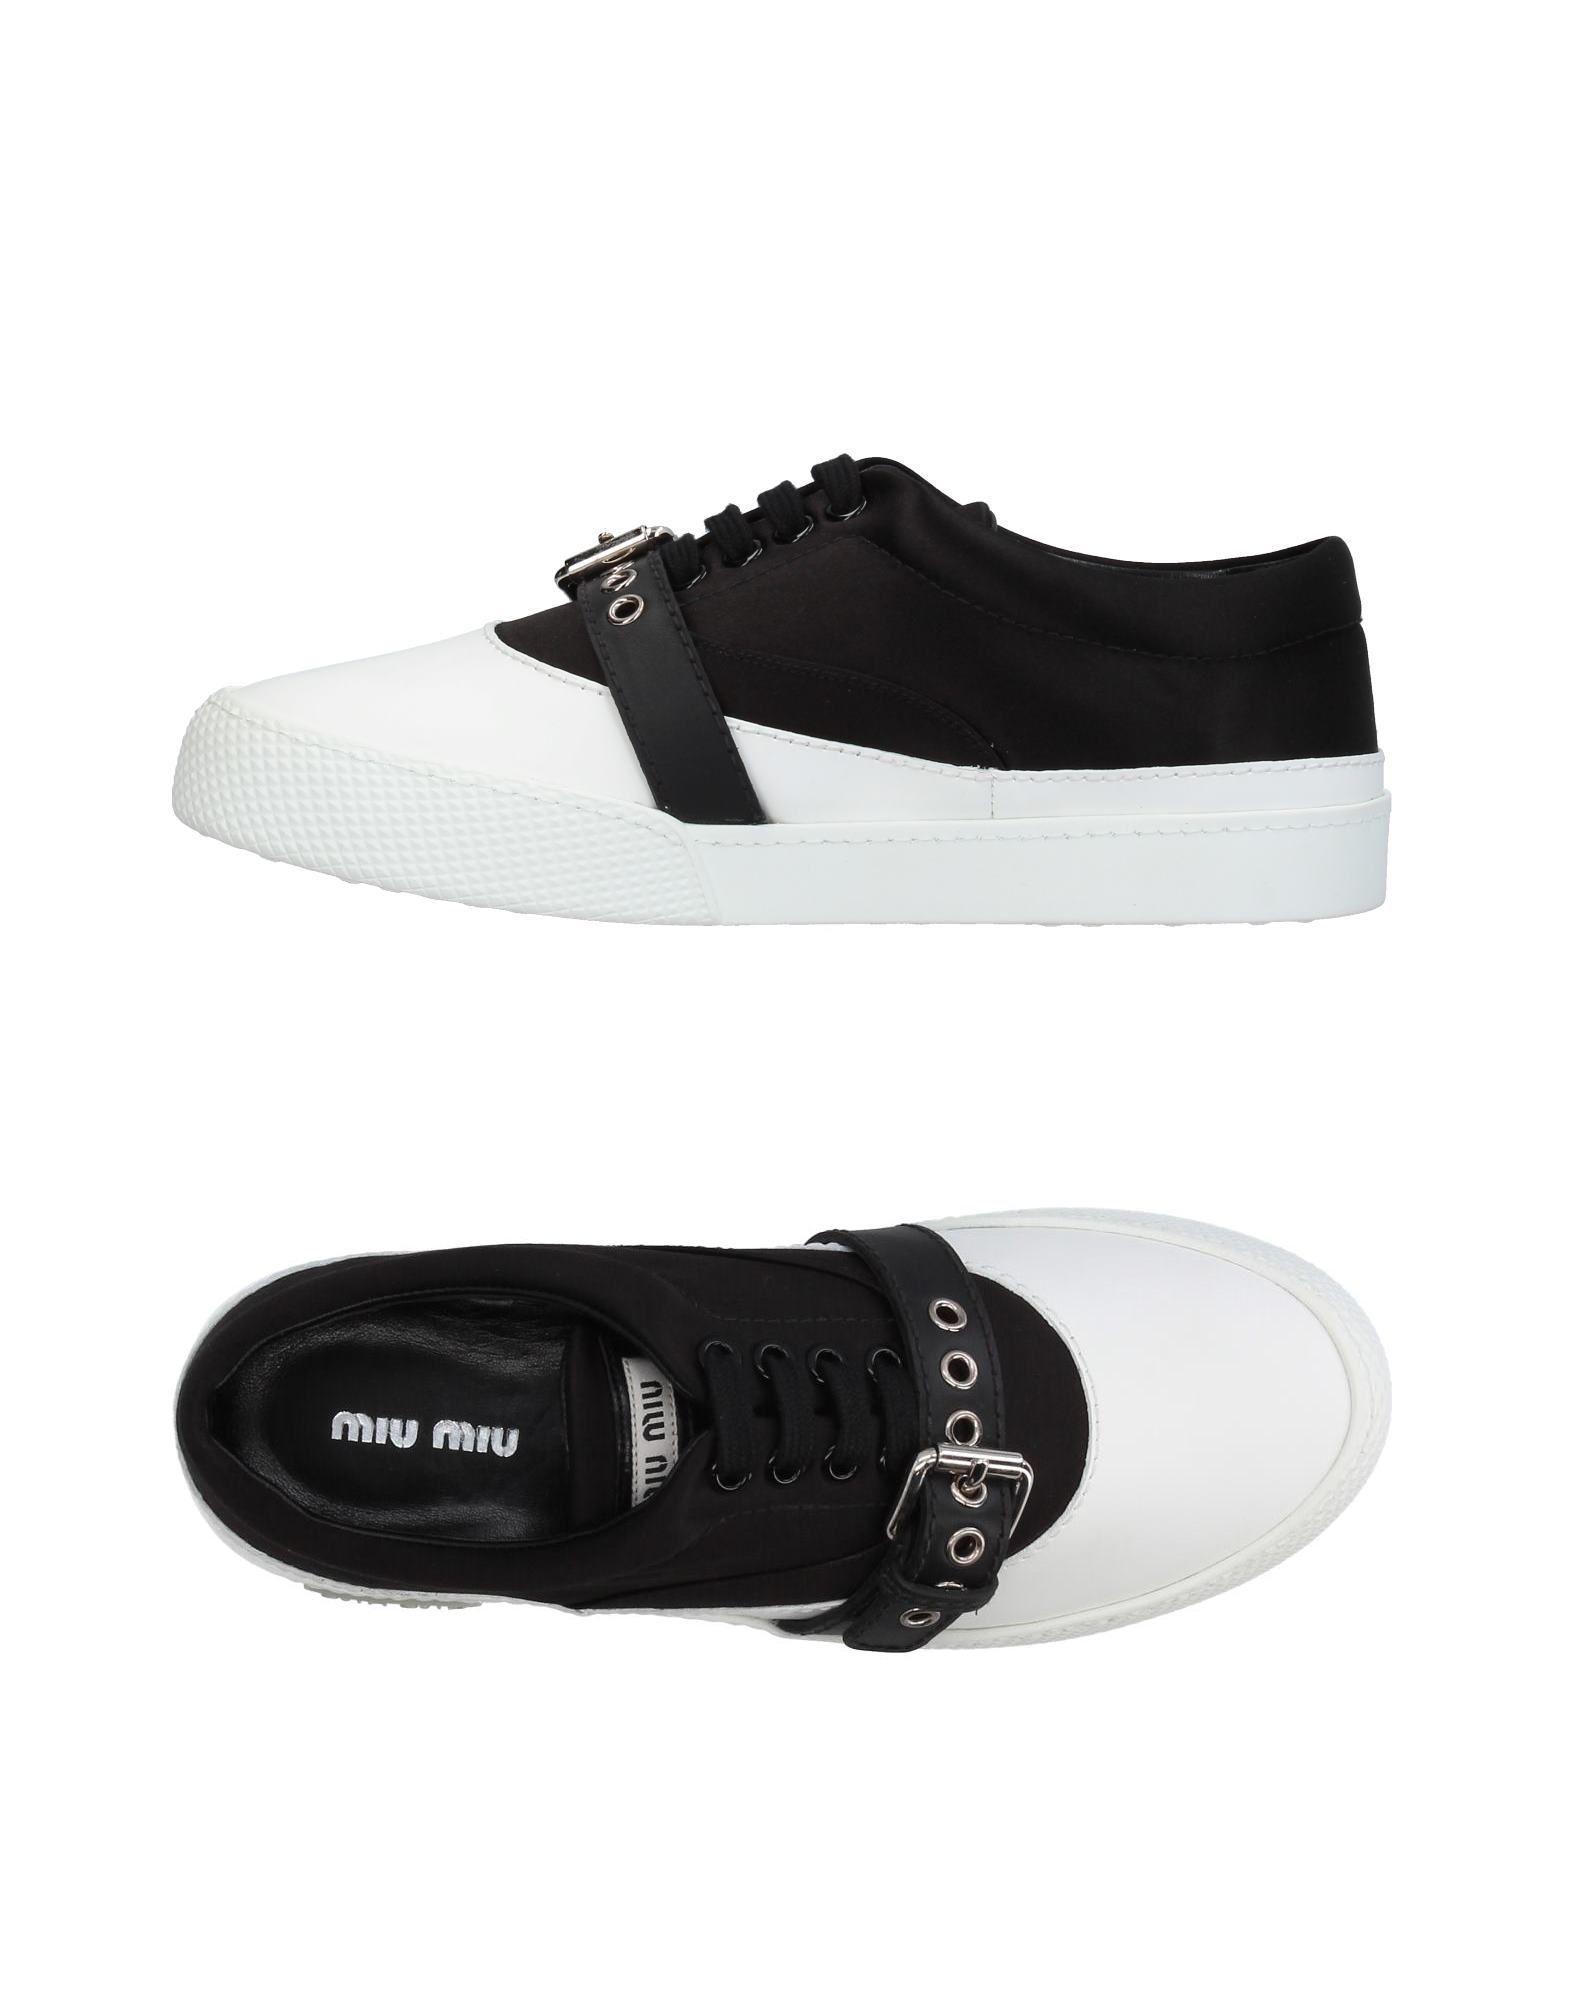 Sneakers Miu Miu Femme - Sneakers Miu Miu sur